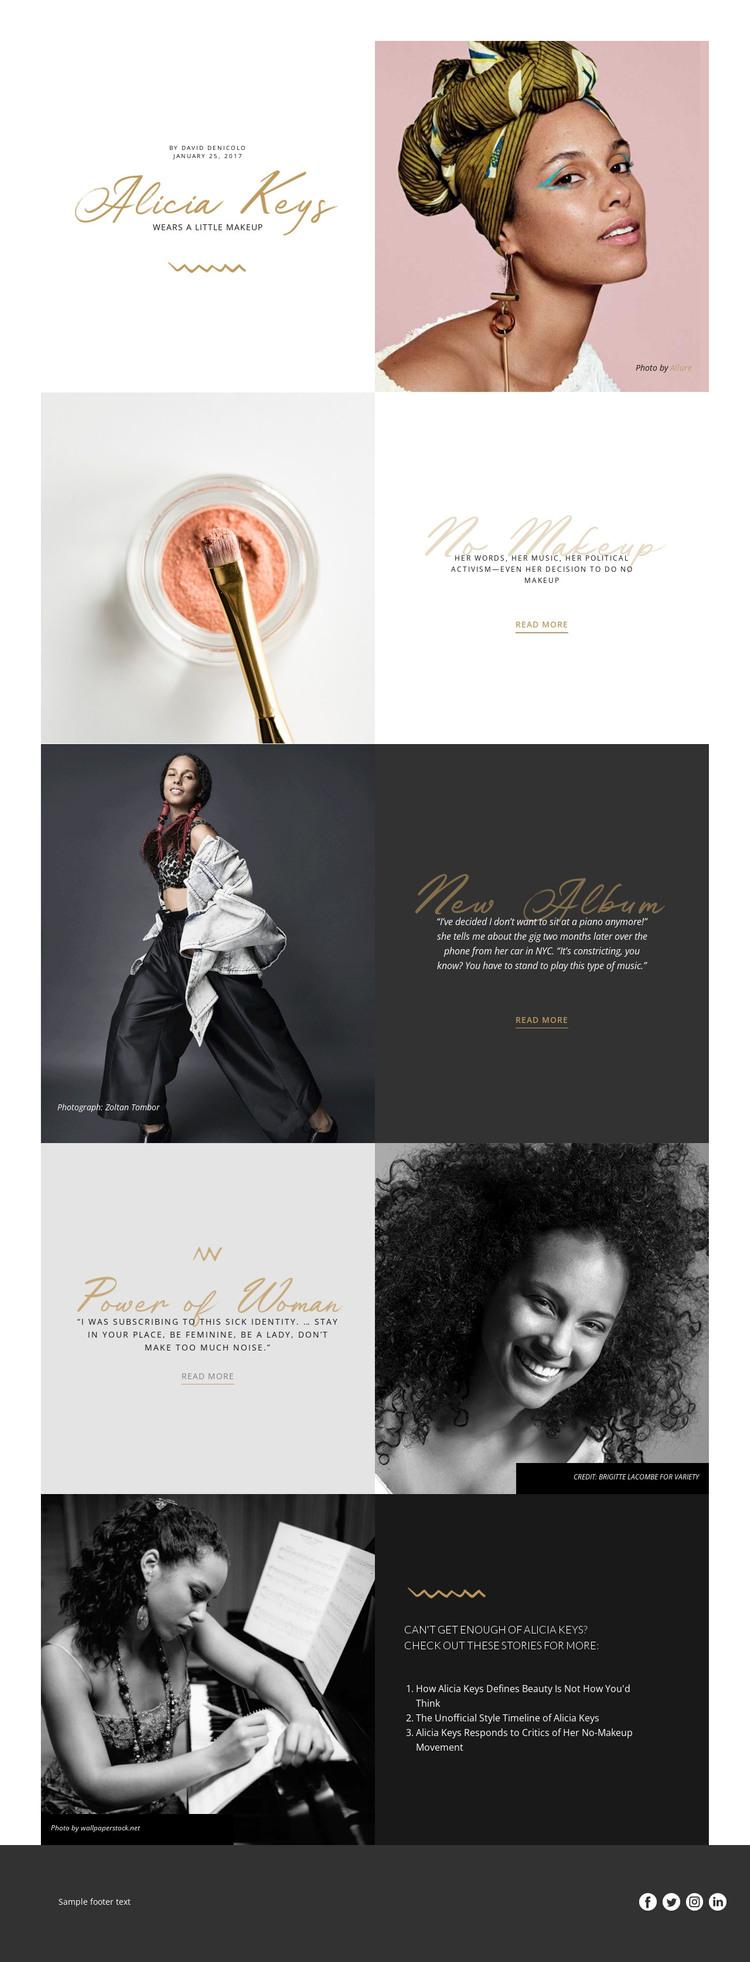 Alicia Keys Web Design